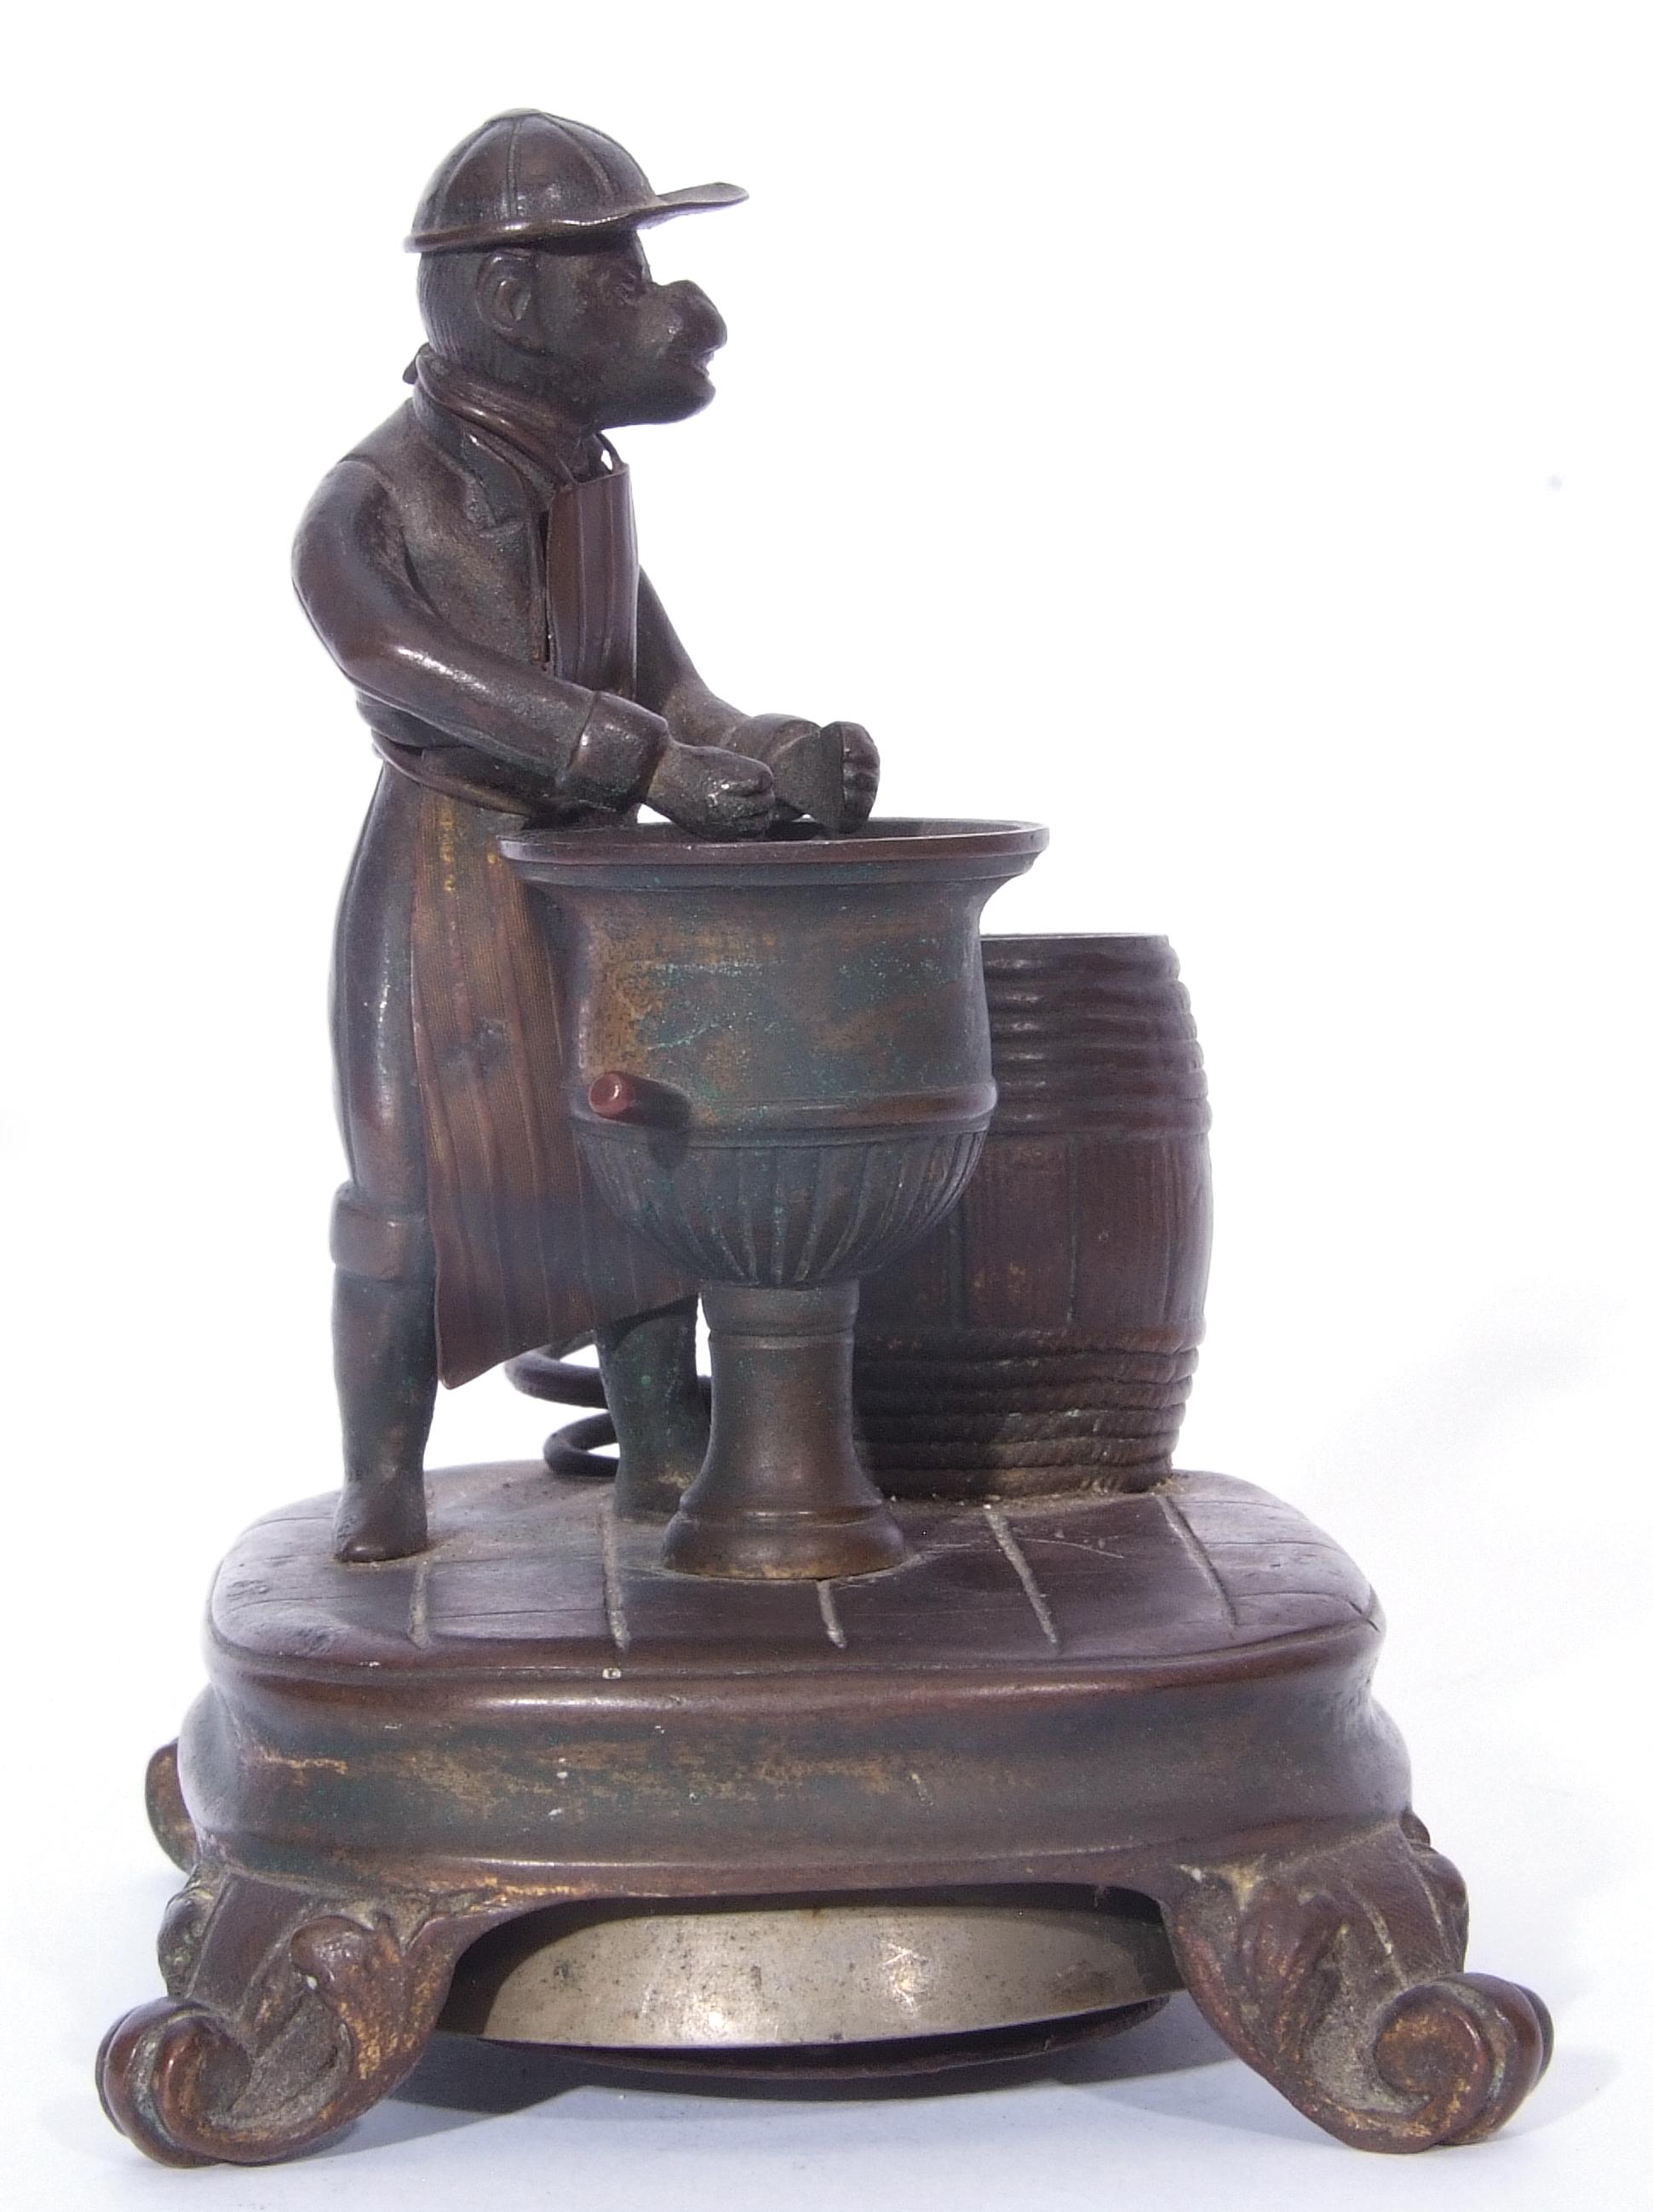 Antique bronze desk bell, a model of a monkey - Image 4 of 11